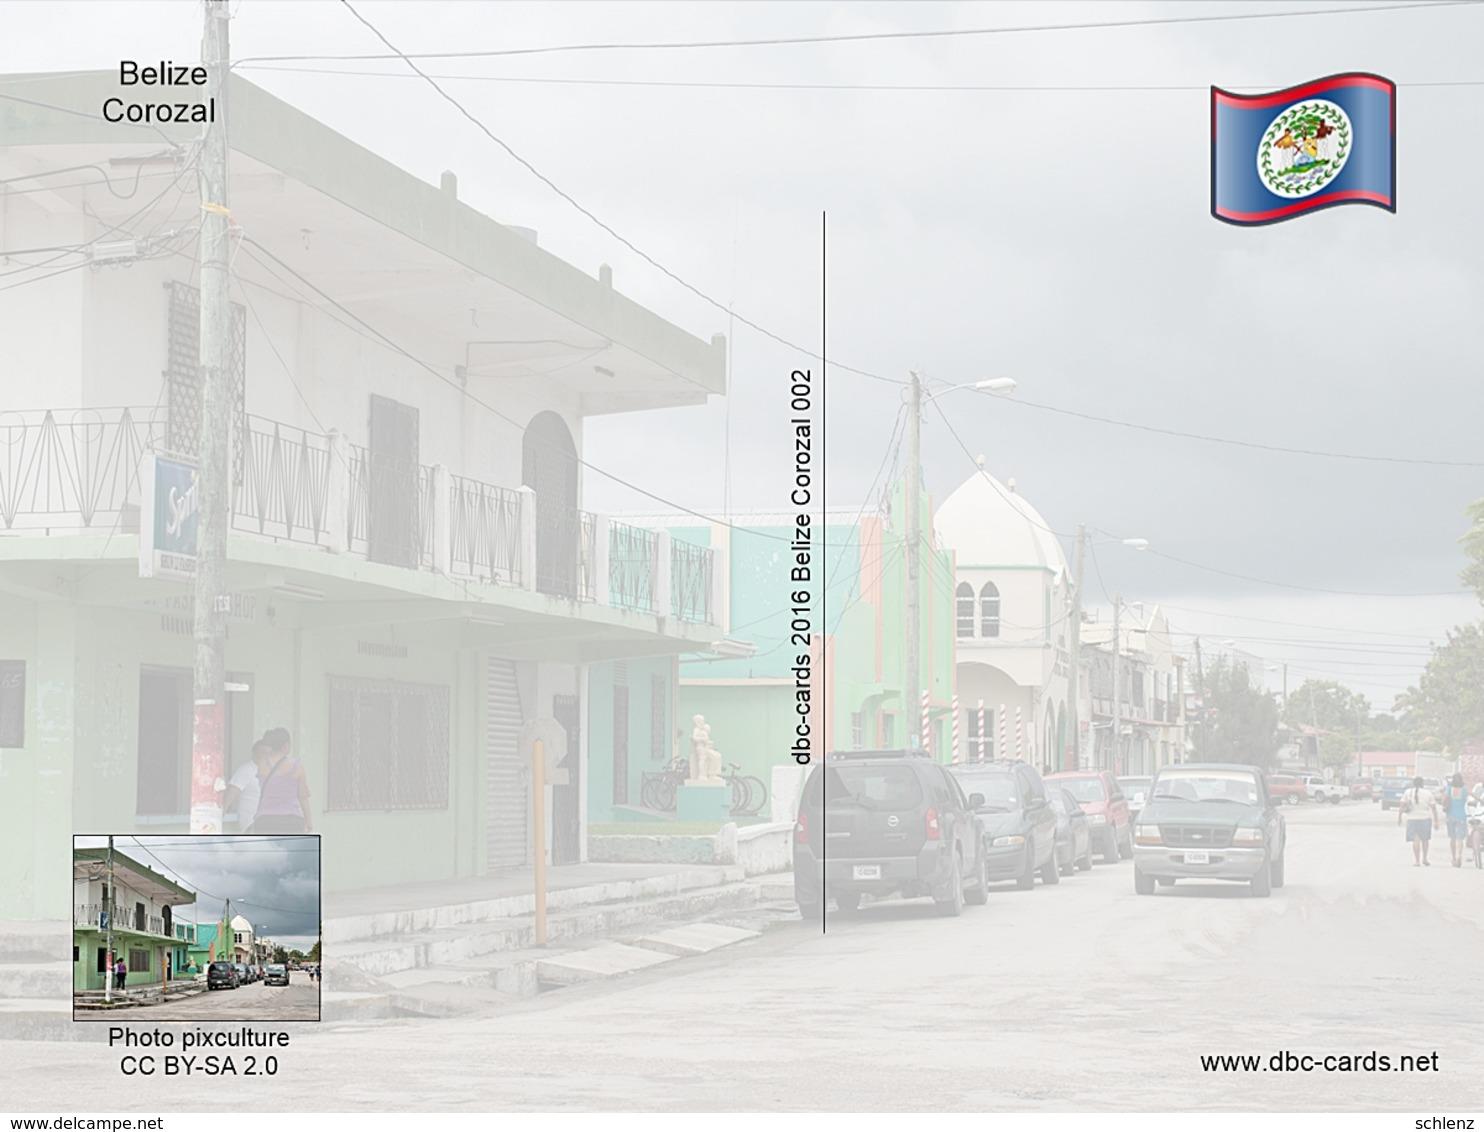 Corozal Belize 2 - Belize